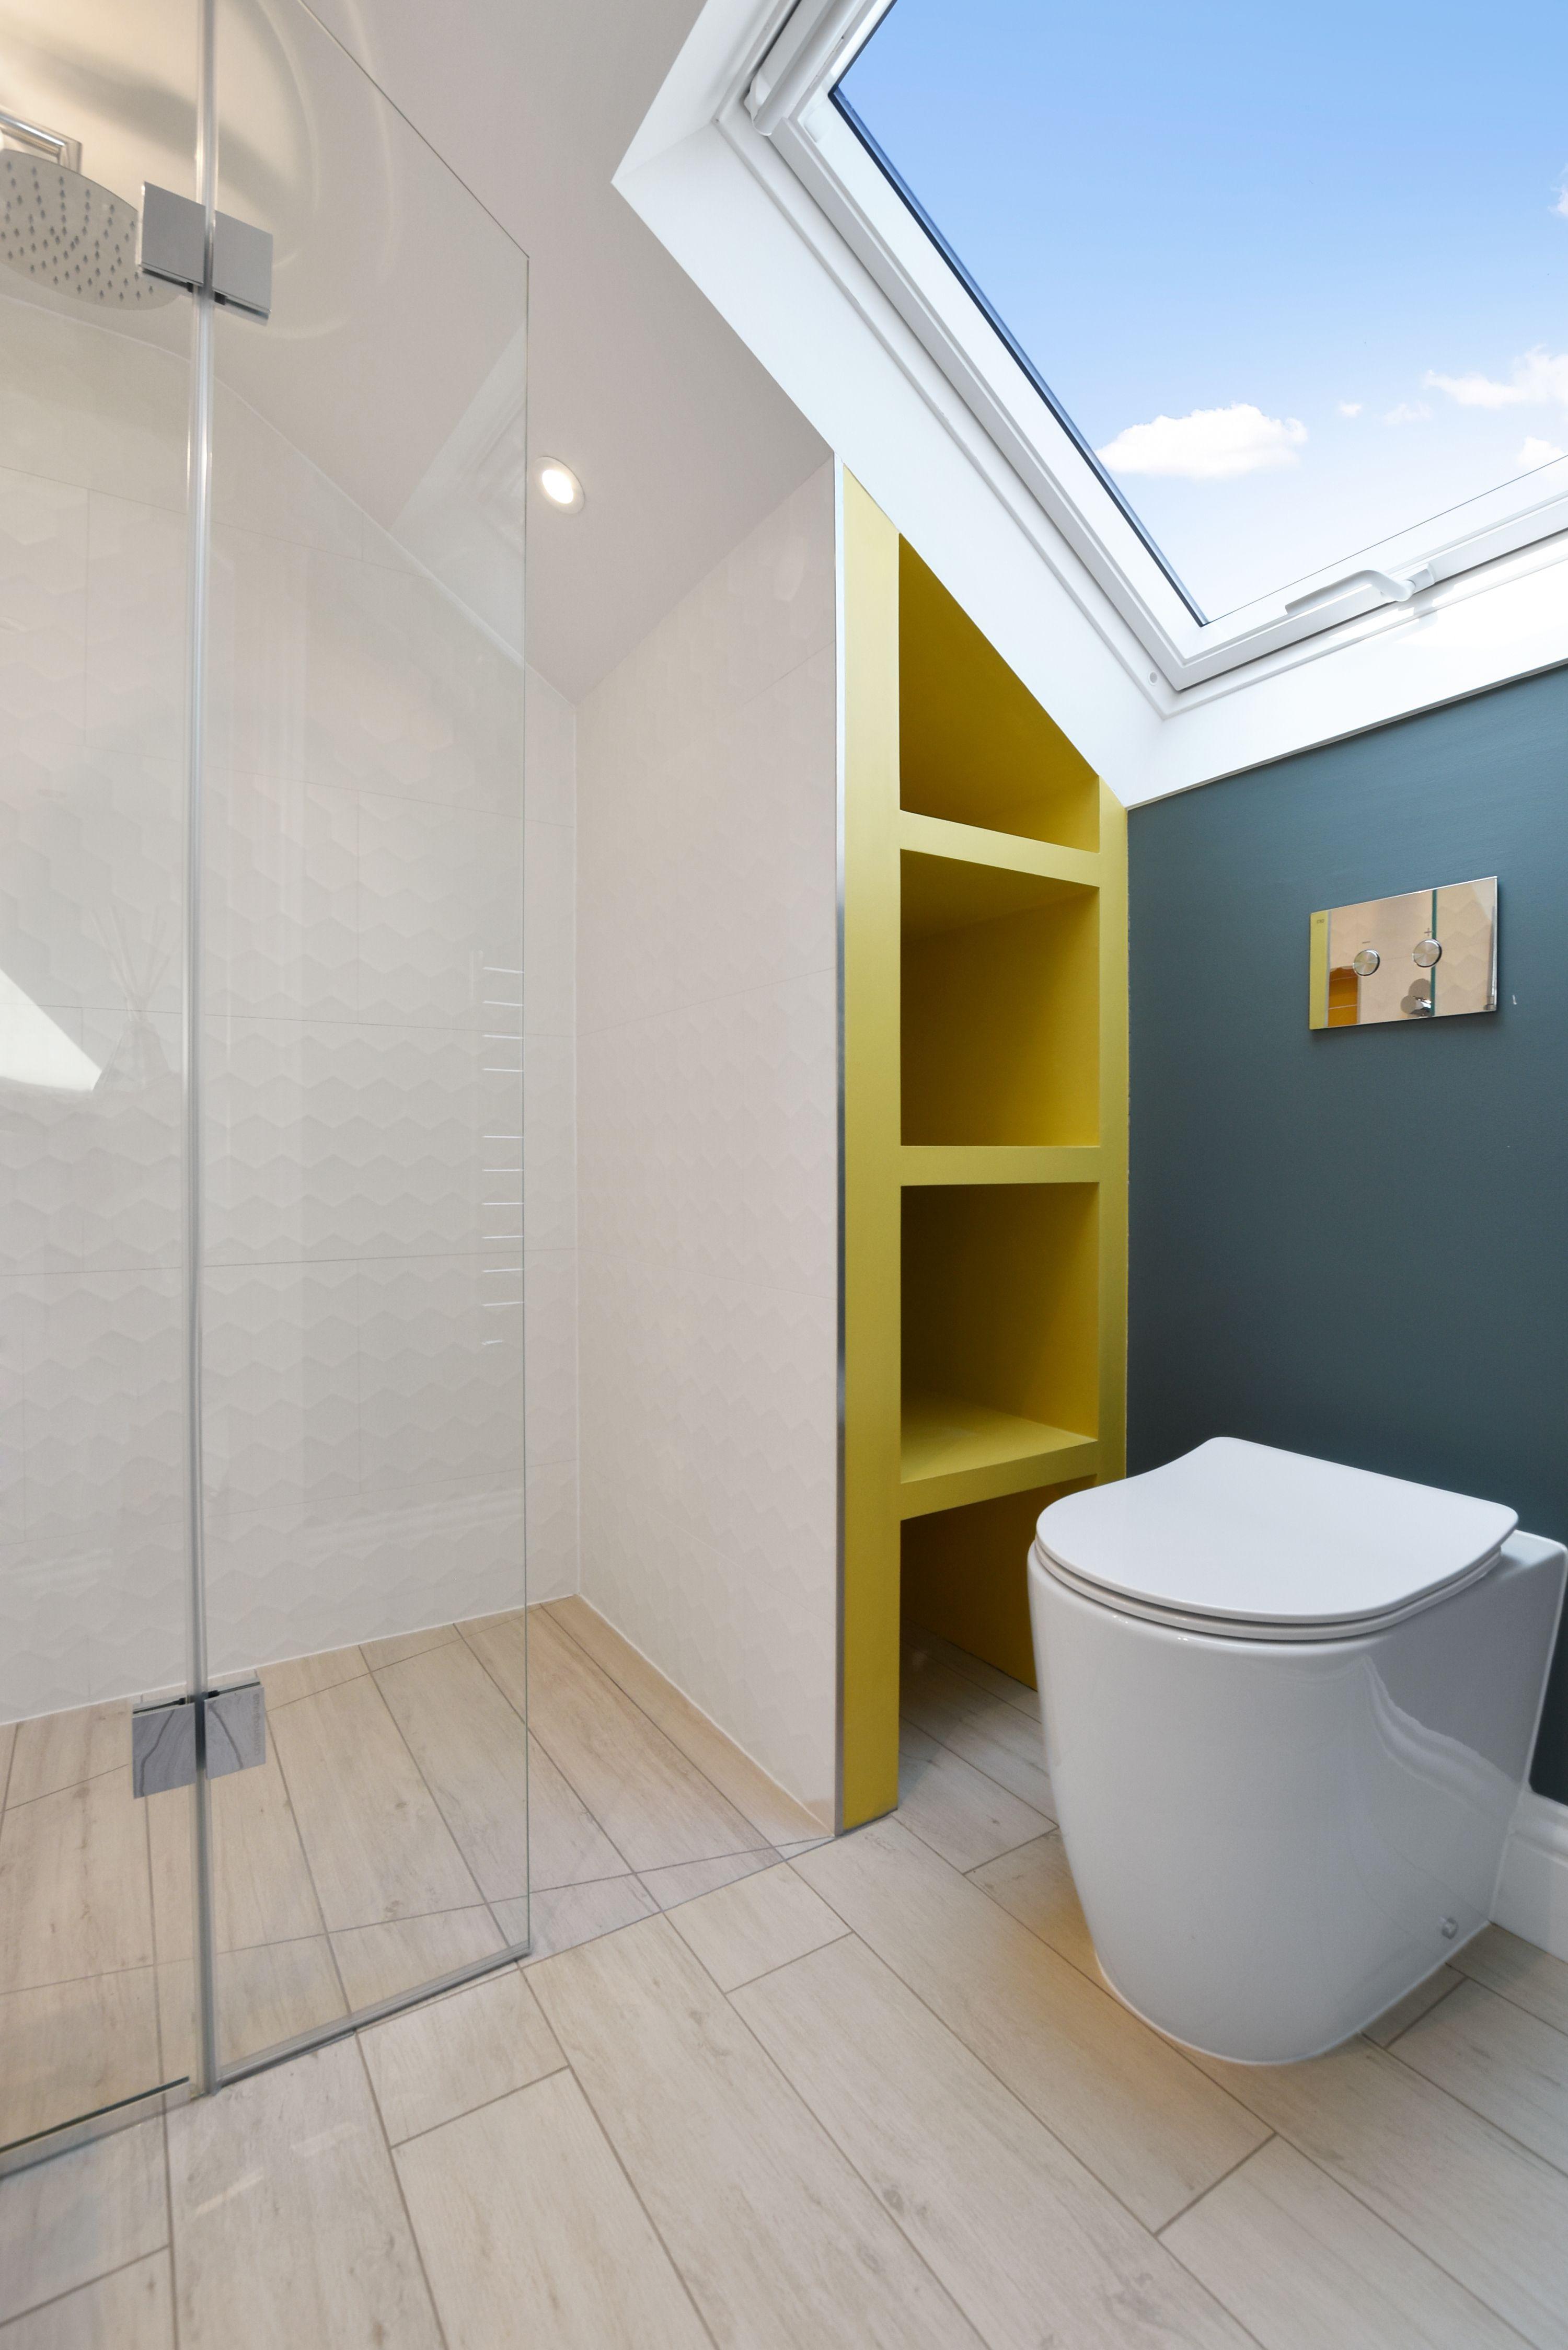 Bathroomsbydesign Is One Of The Uk S Leading Bathroom Retailers Championing Design Excellence Innovation Bathroom Solutions Bathroom Layout Bathroom Design